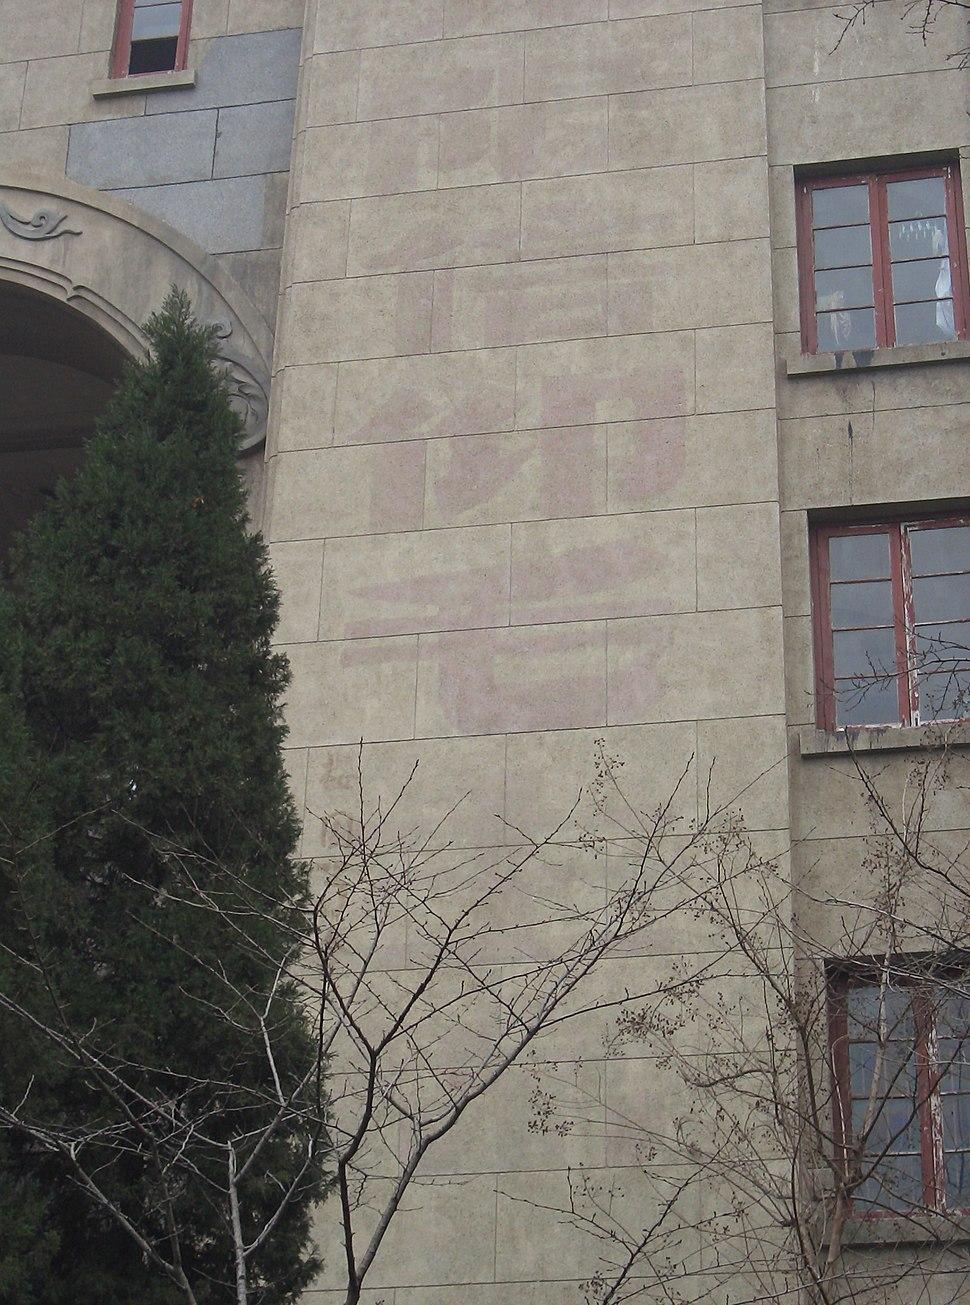 Propaganda slogan removed - Wuhan University